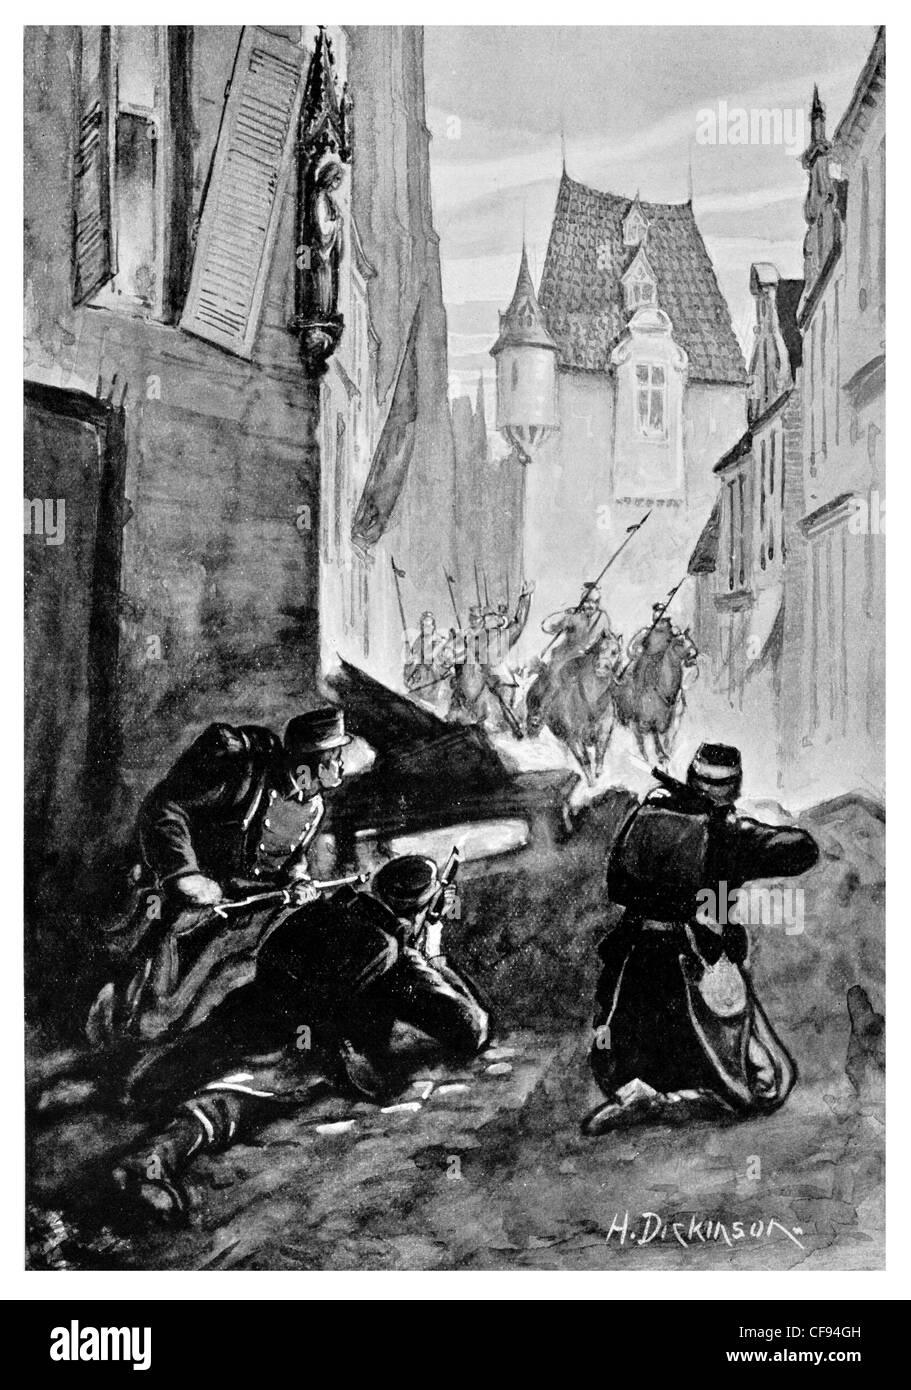 Street fighting in Malines Mechelen City Hall Belgium cavalry charge under gun fire rifle shot shooting defense - Stock Image